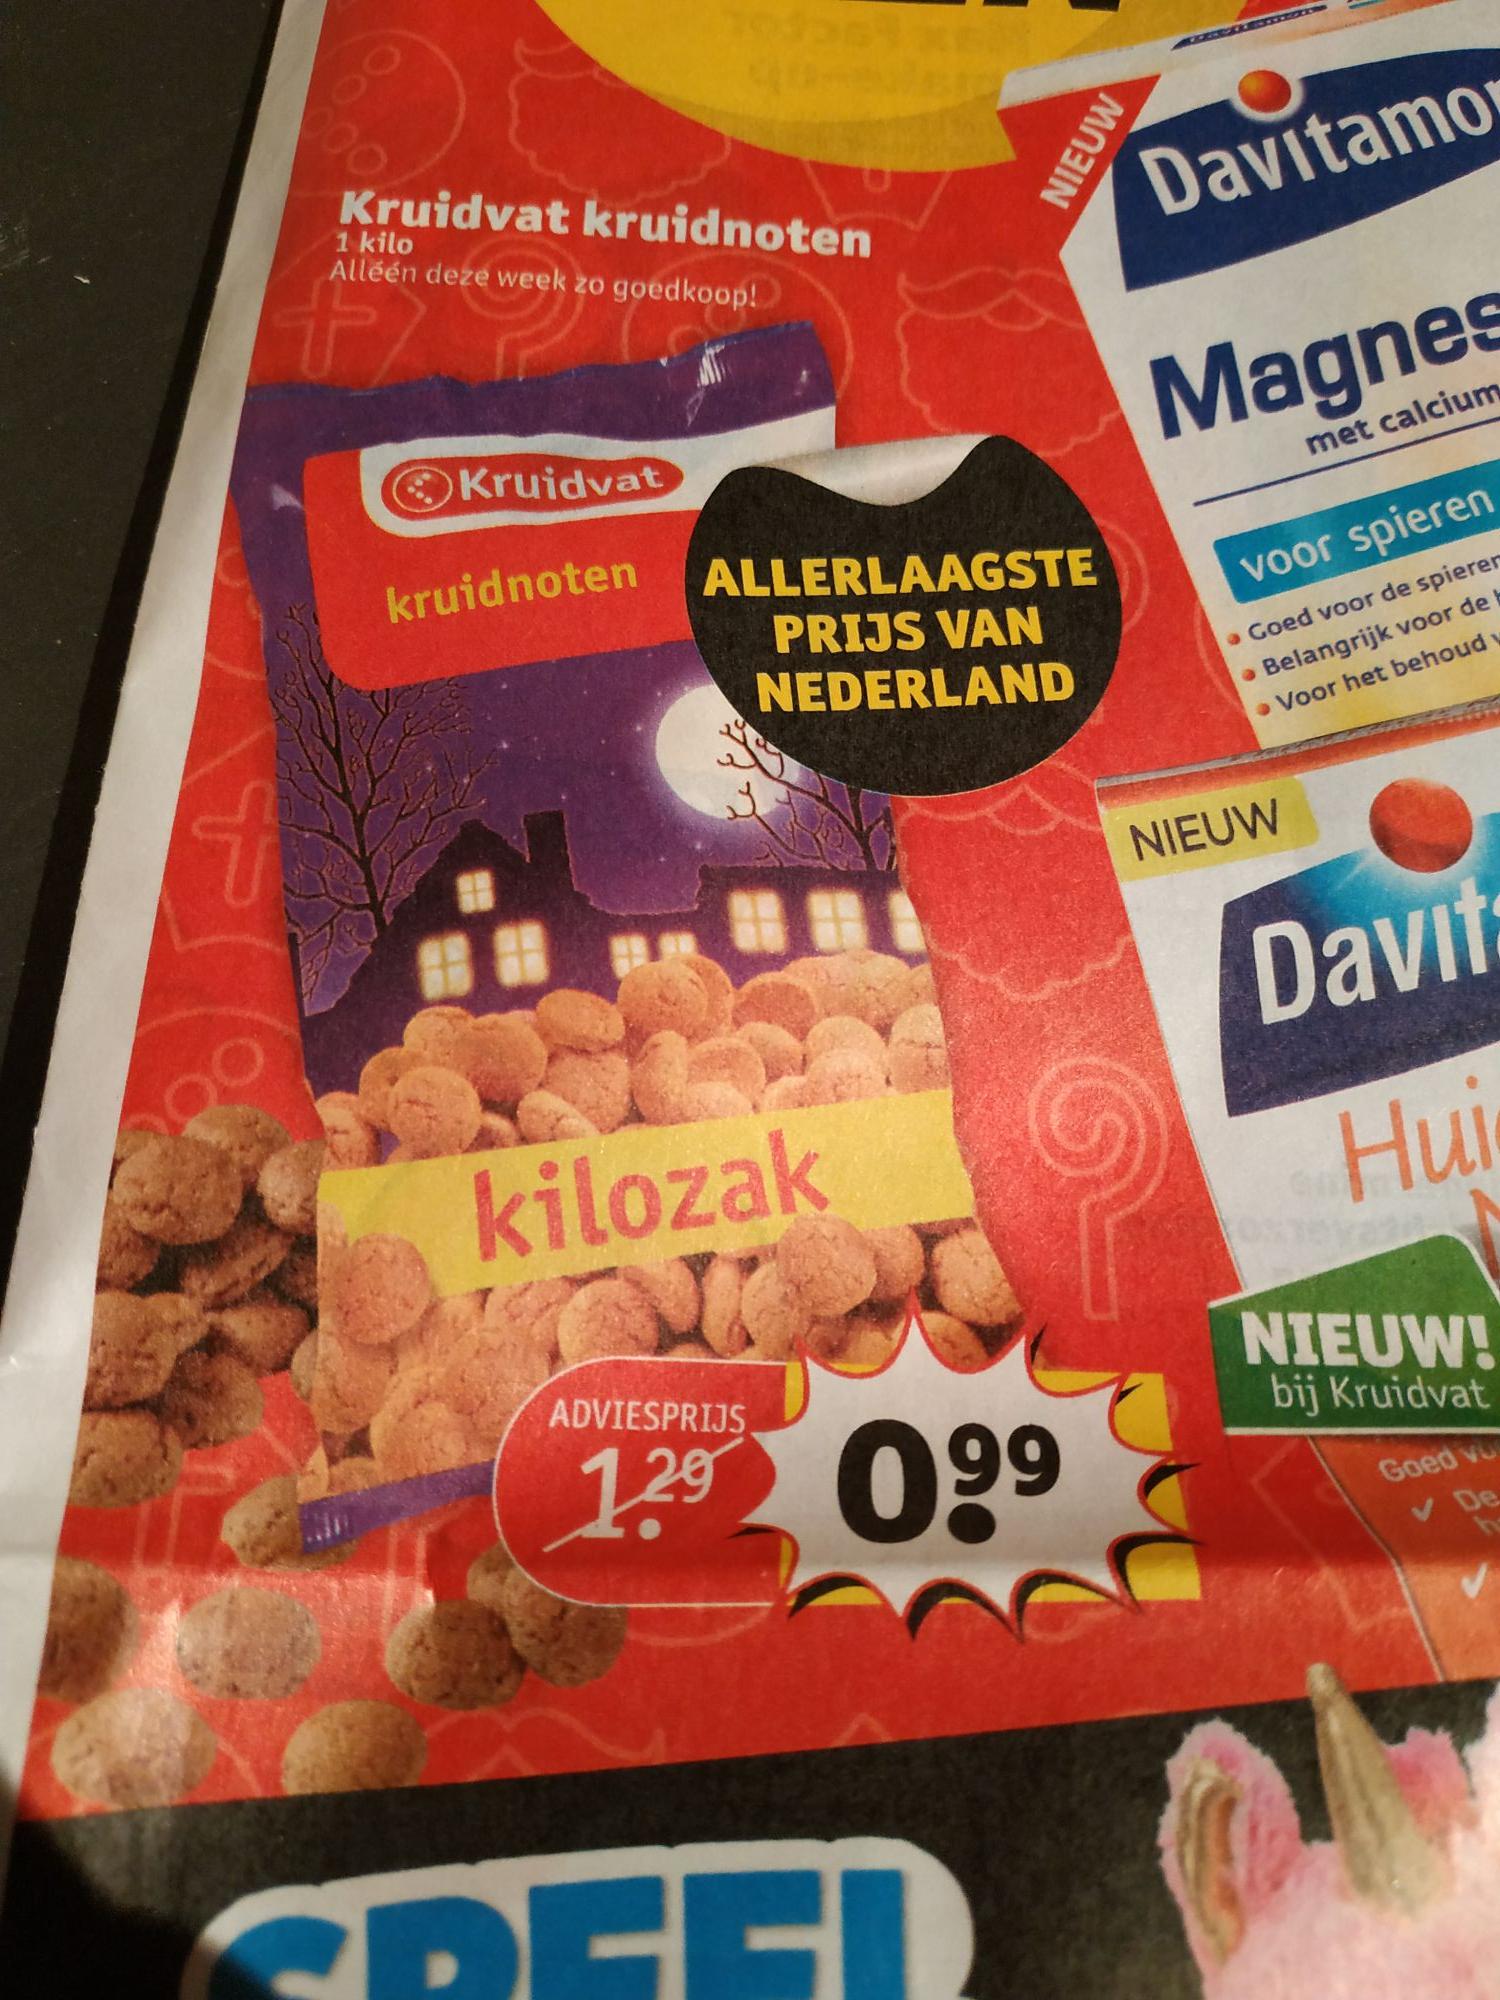 1 Kilo kruidnoten/pepernoten €0,99 kruidvat